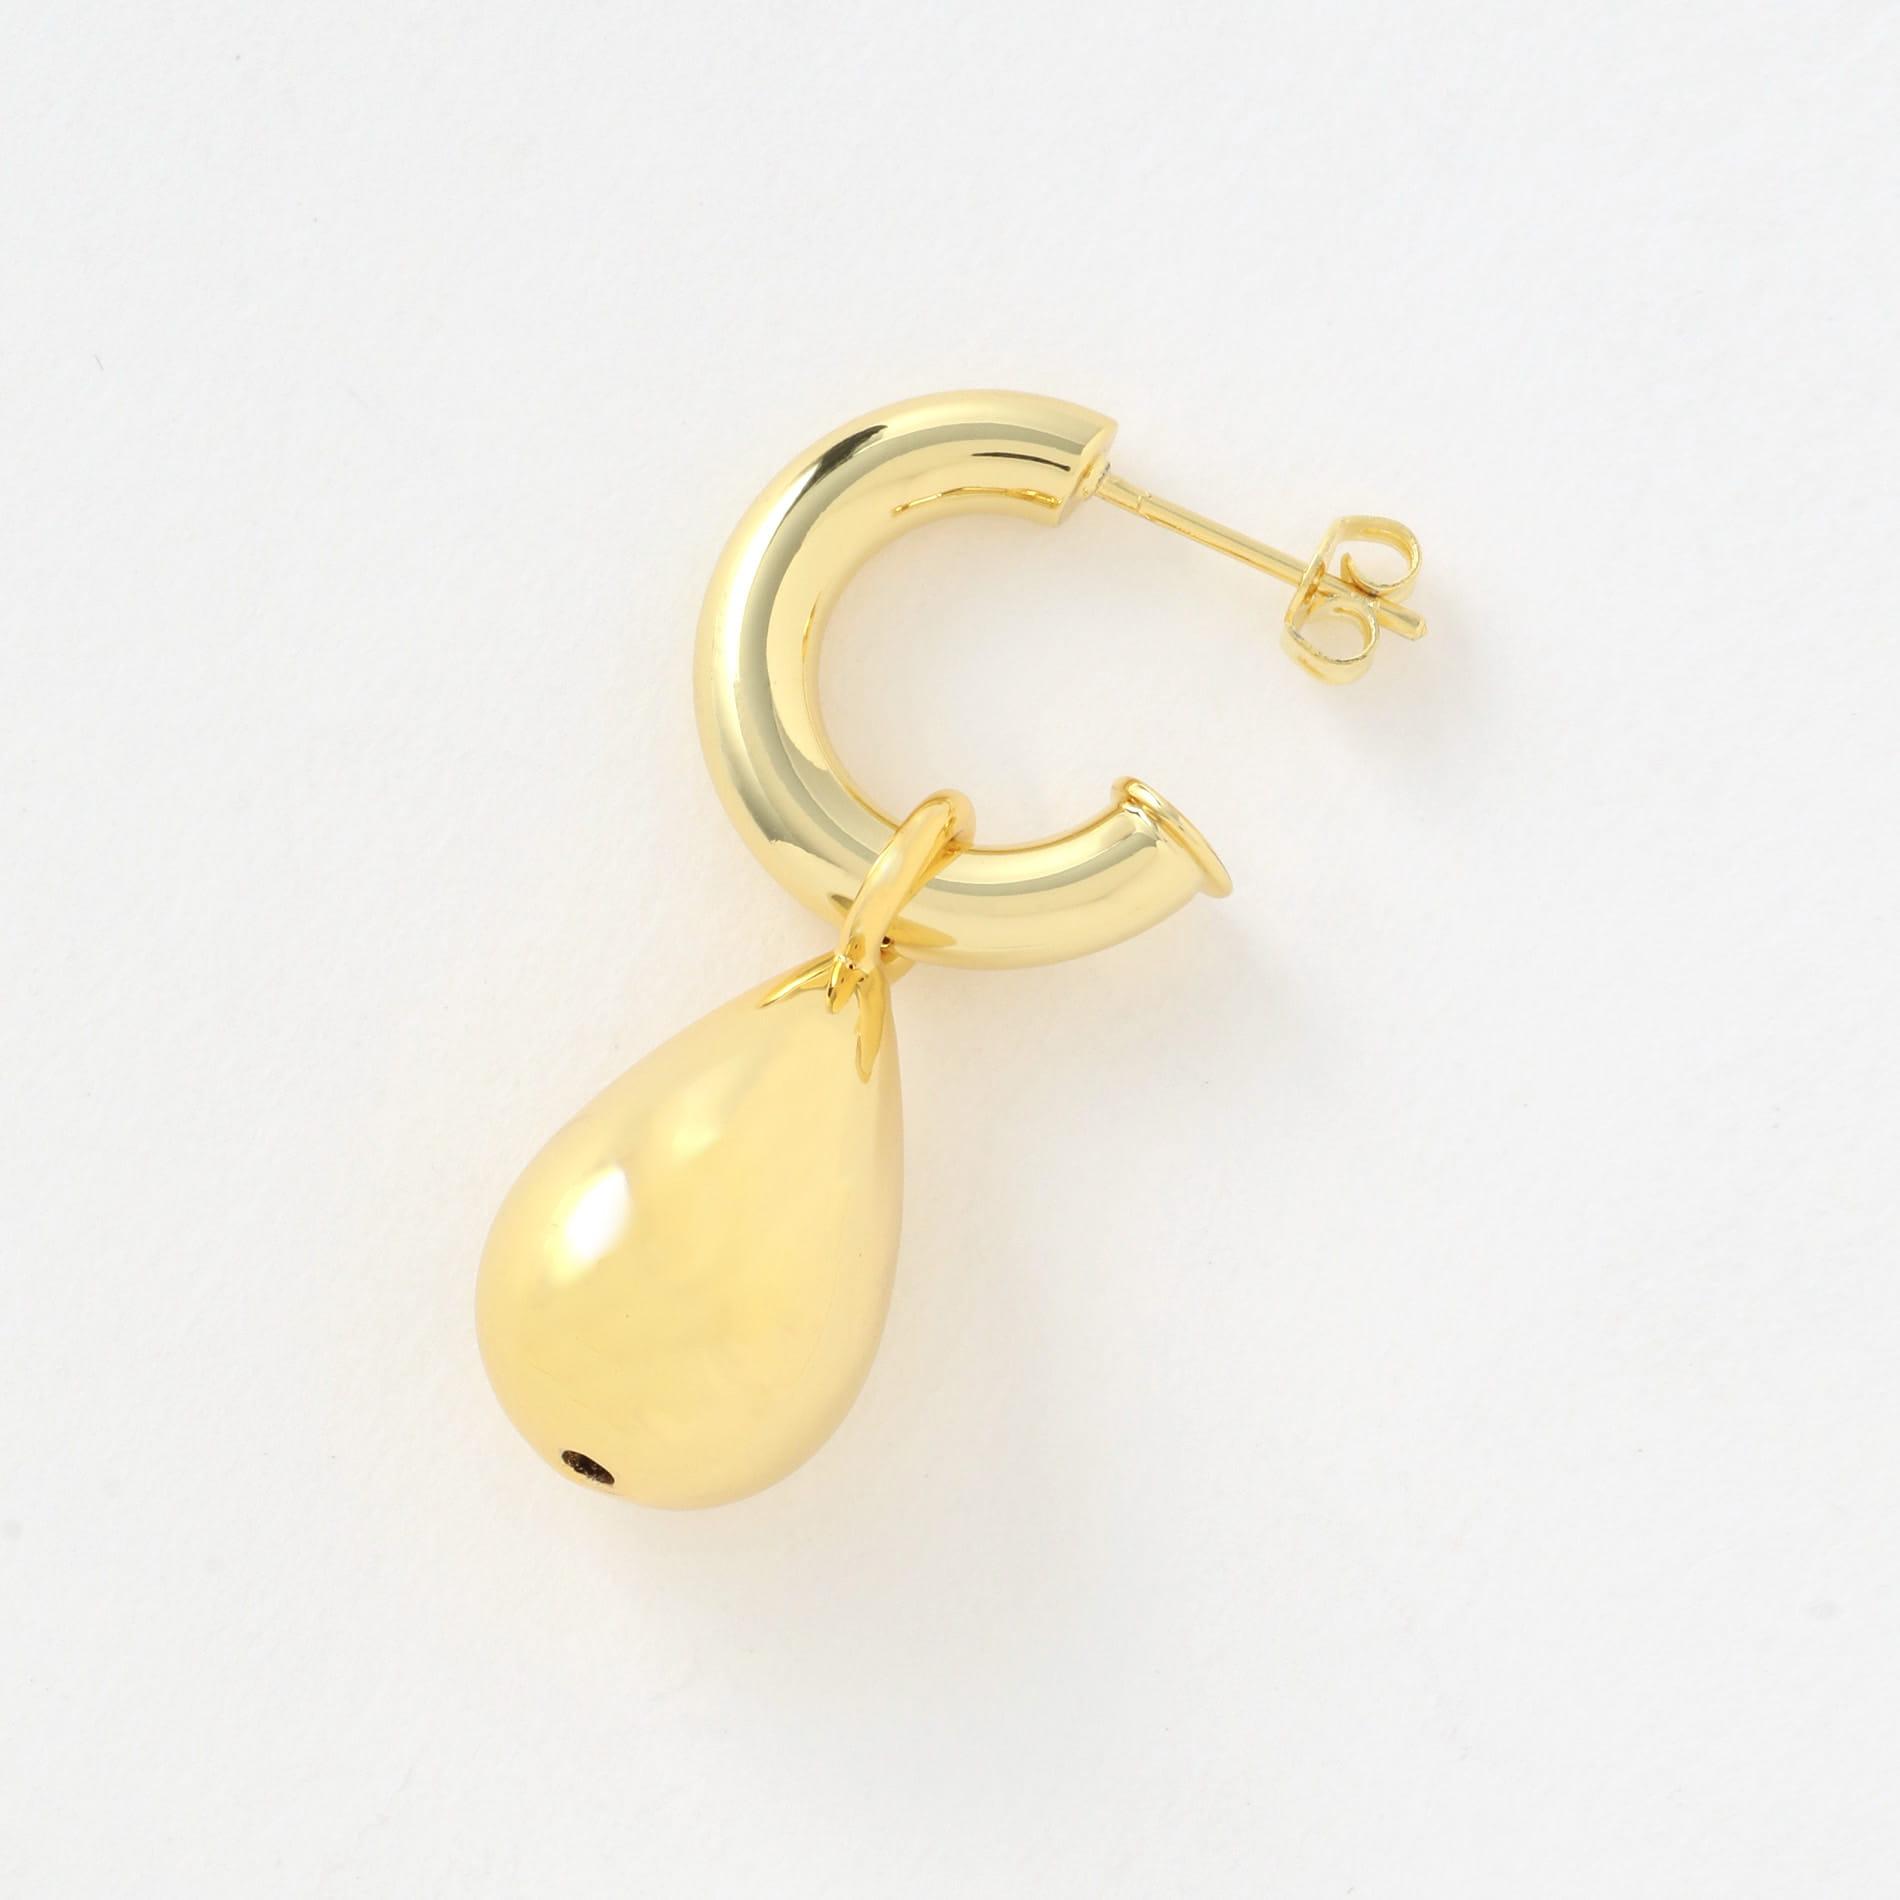 【MOYA】WOMEN ピアス ALMA HOOPEARRINGS 14CT GOLD PLATED BRASS MOYA004GP